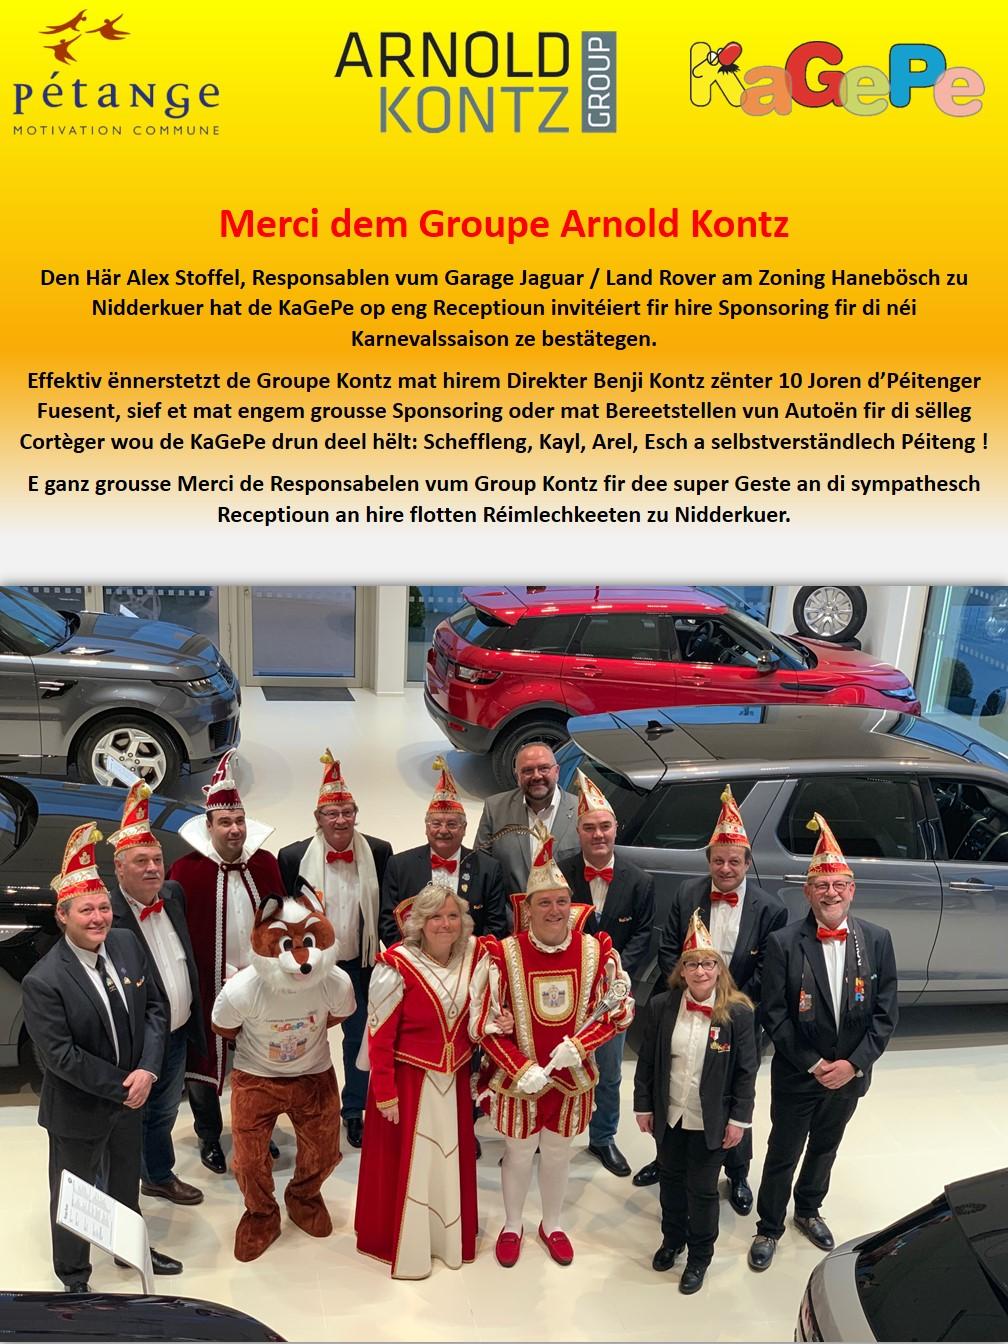 Merci-dem-Groupe-Arnold-Kontz